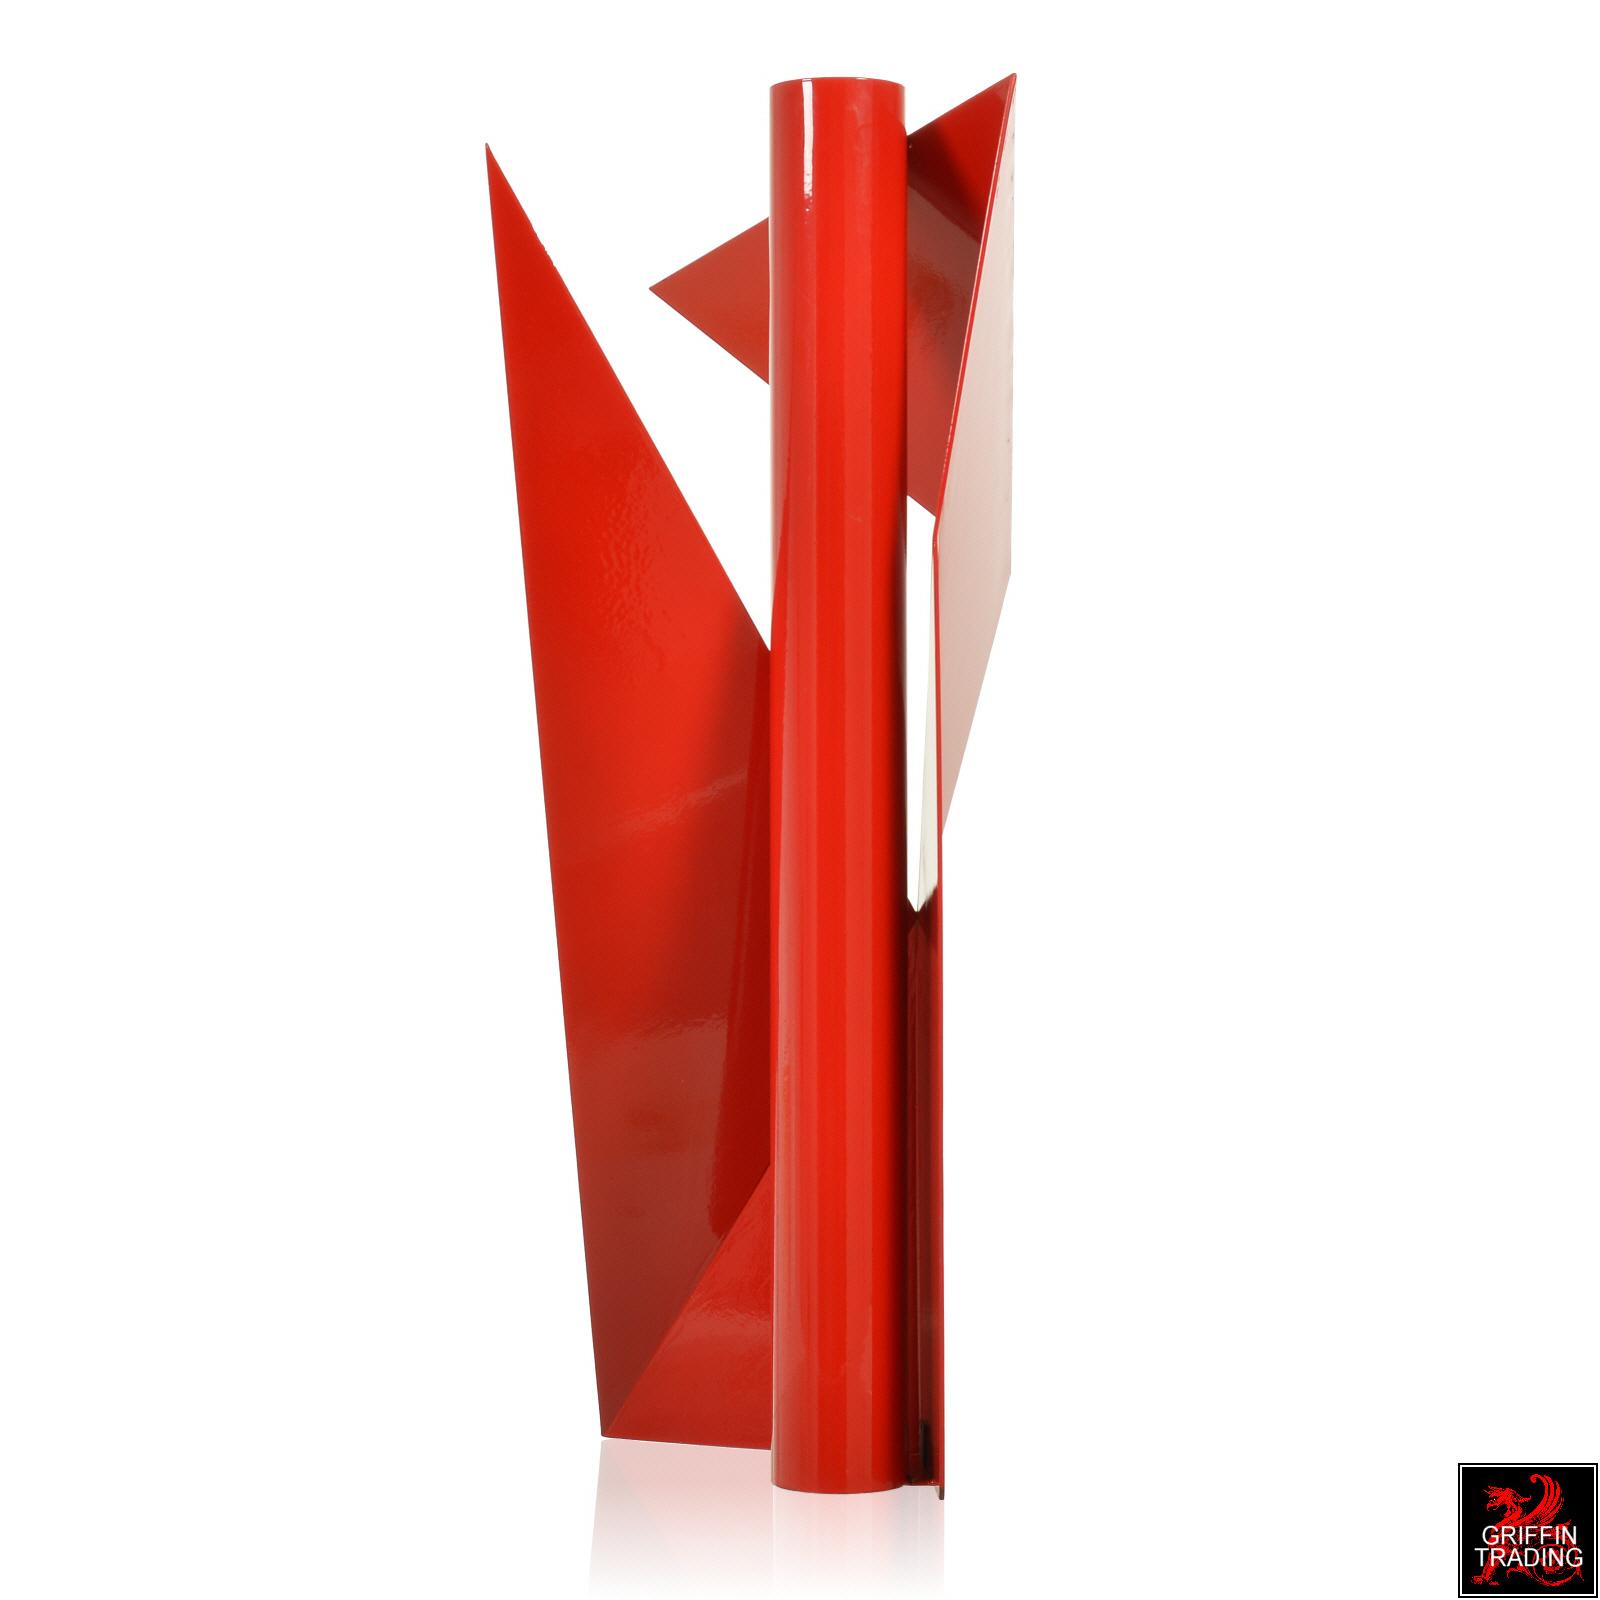 Steel geometric sculpture by sculptor Betty Gold.